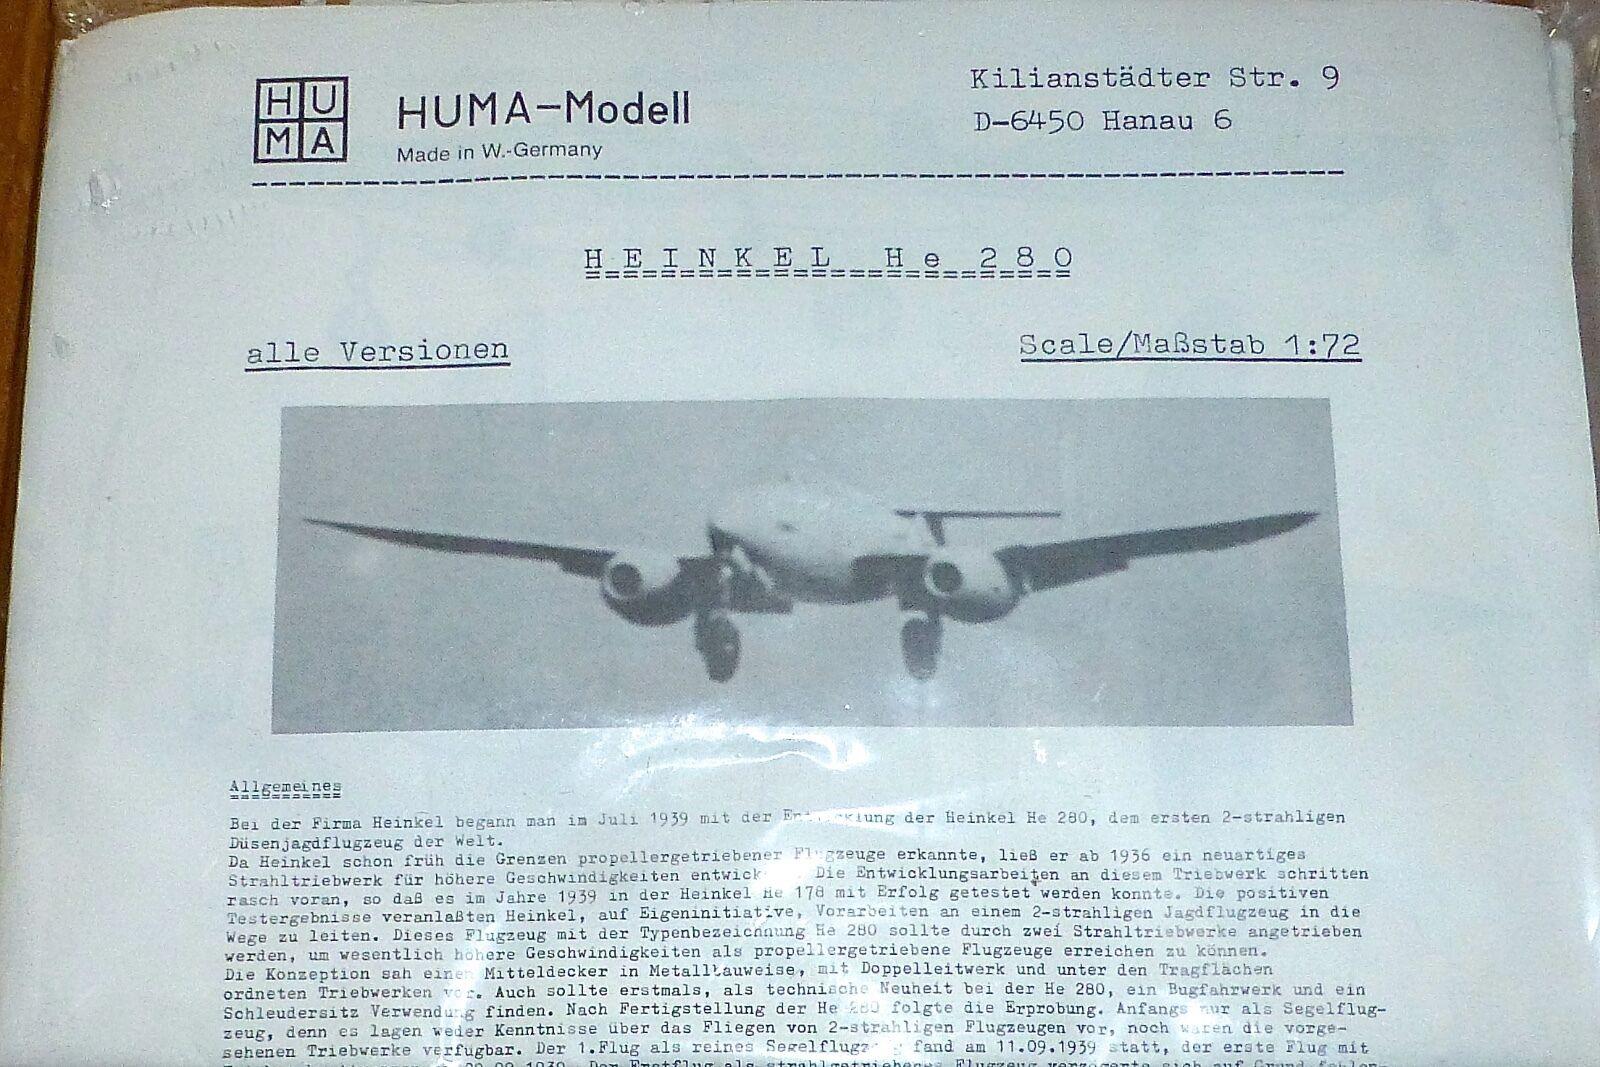 saldi Heinkel Lui Lui Lui 280 Huma modellolo 1 72 Aeroplano Kit di Costruzione Ricostruita Å  Ultimo 2018